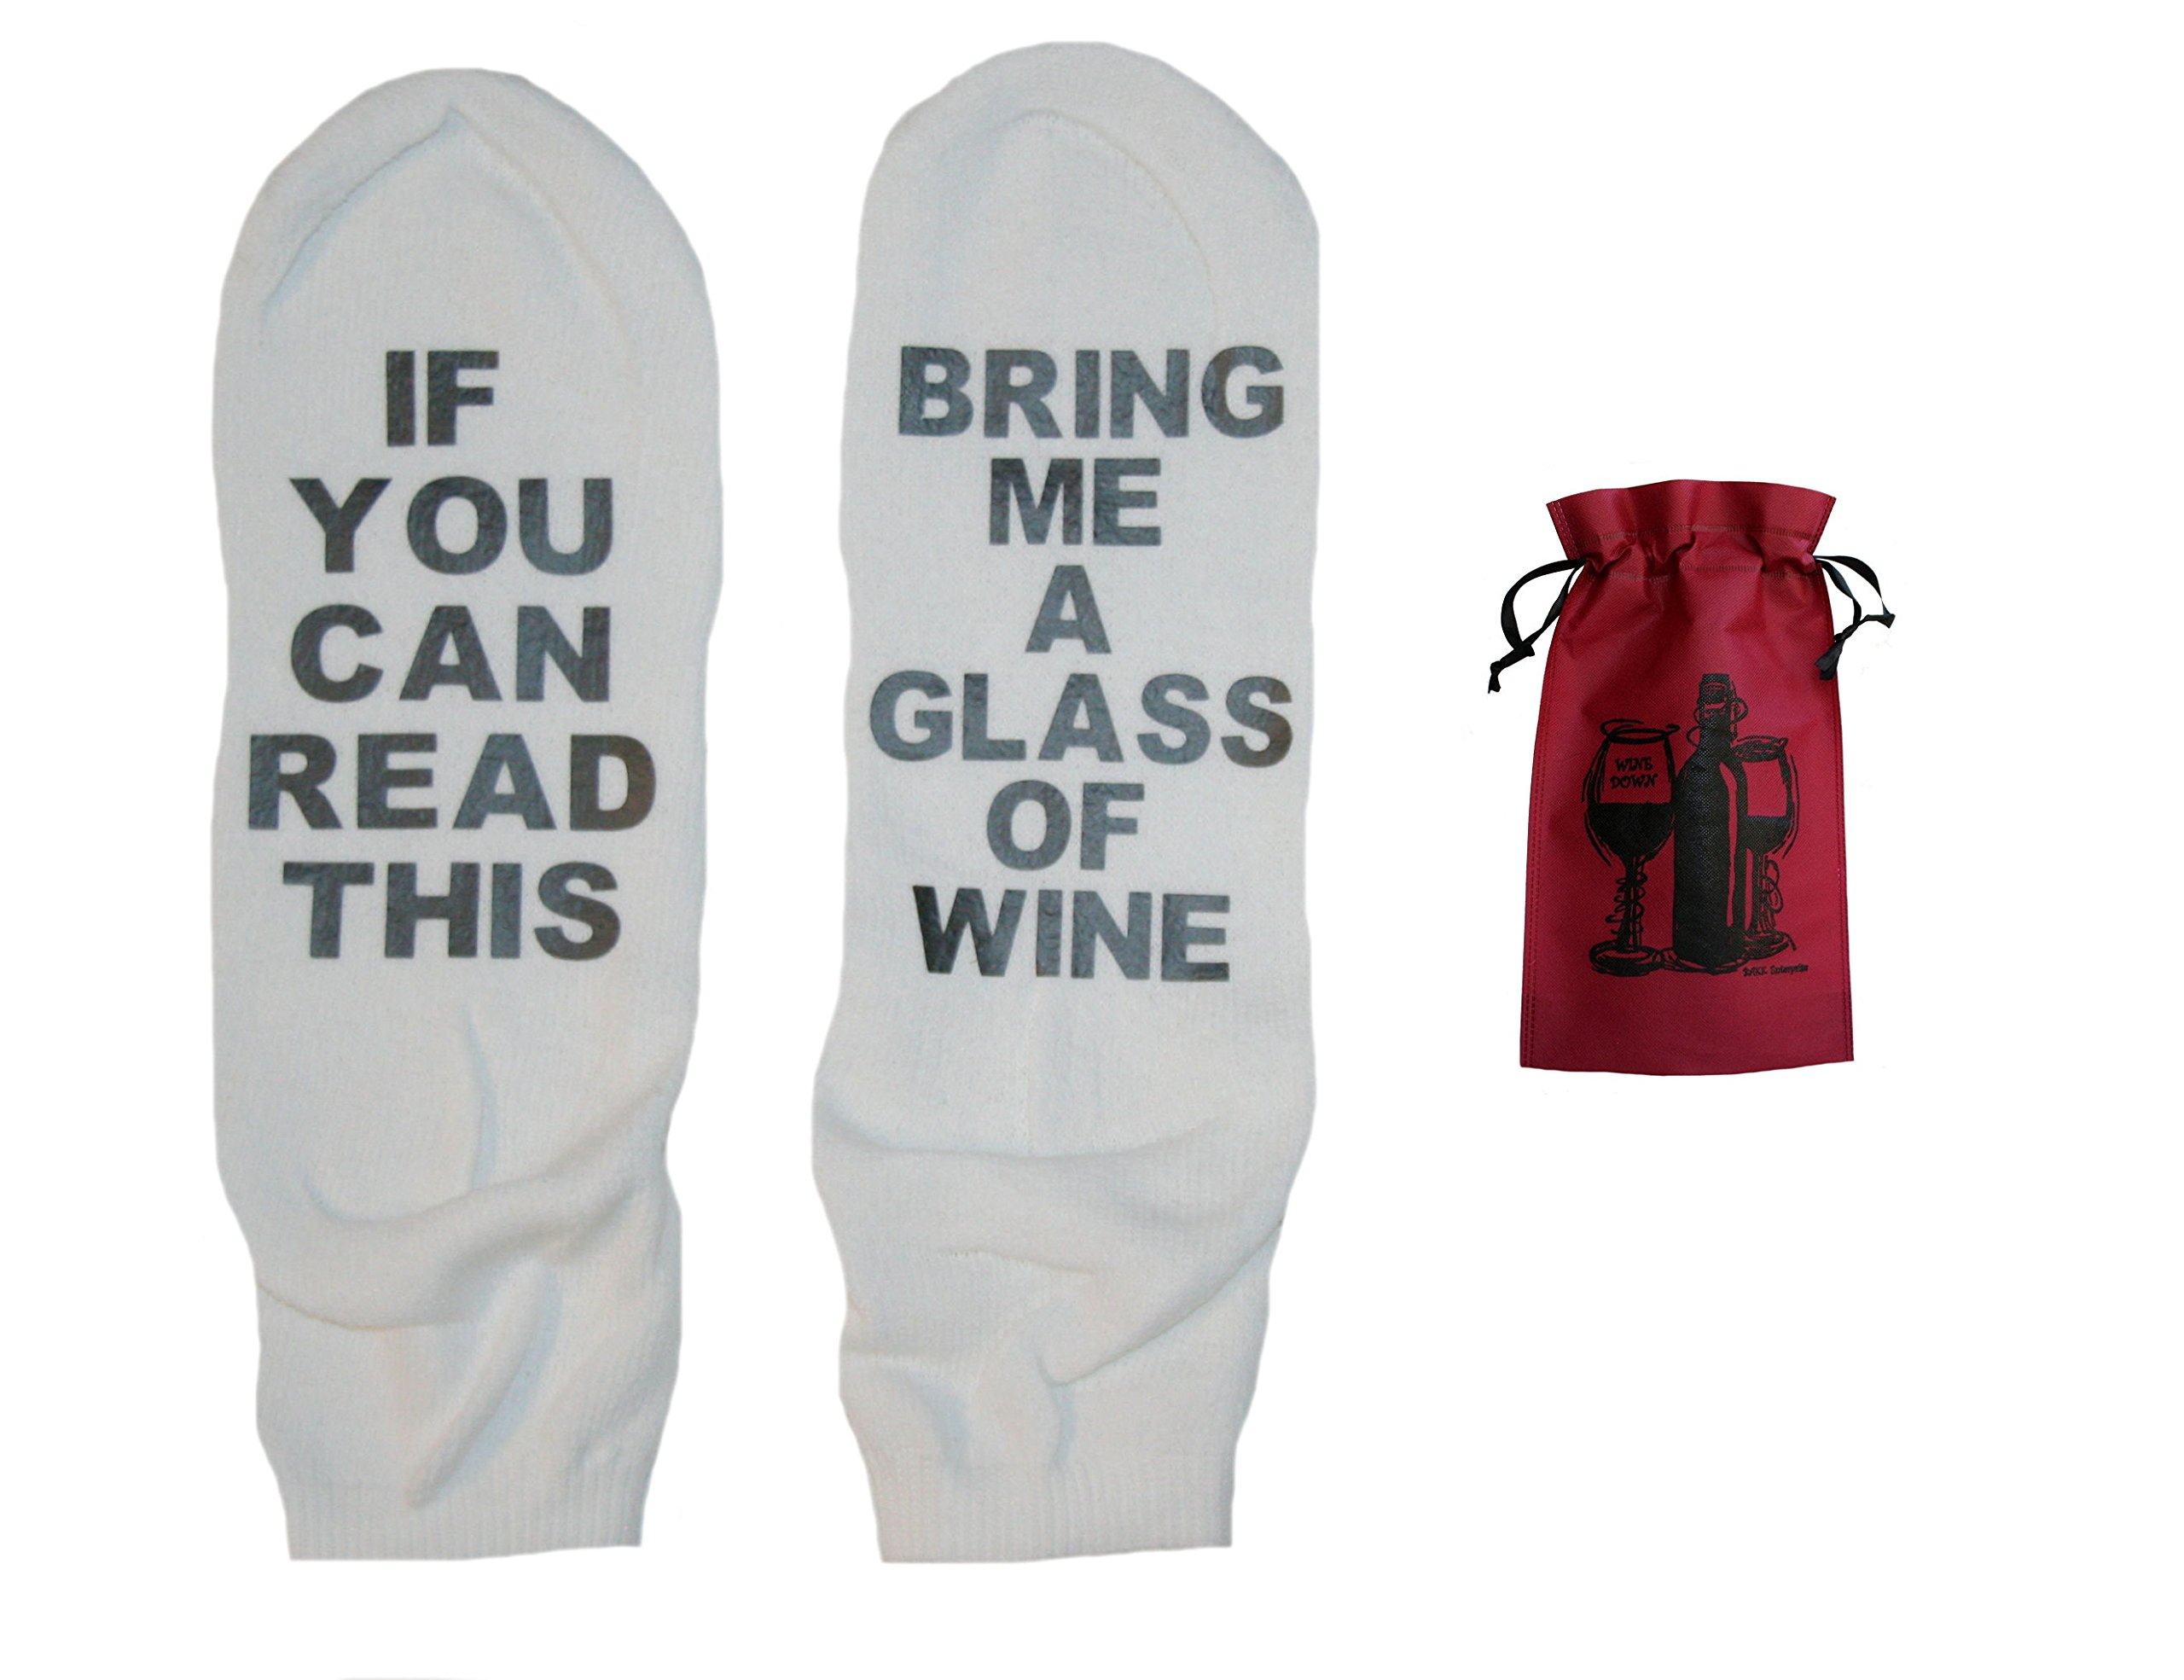 Speaking Socks Bring Me A Glass Of Wine Ankle Socks & Wine Bag Gift Set (11-15, White/Black)